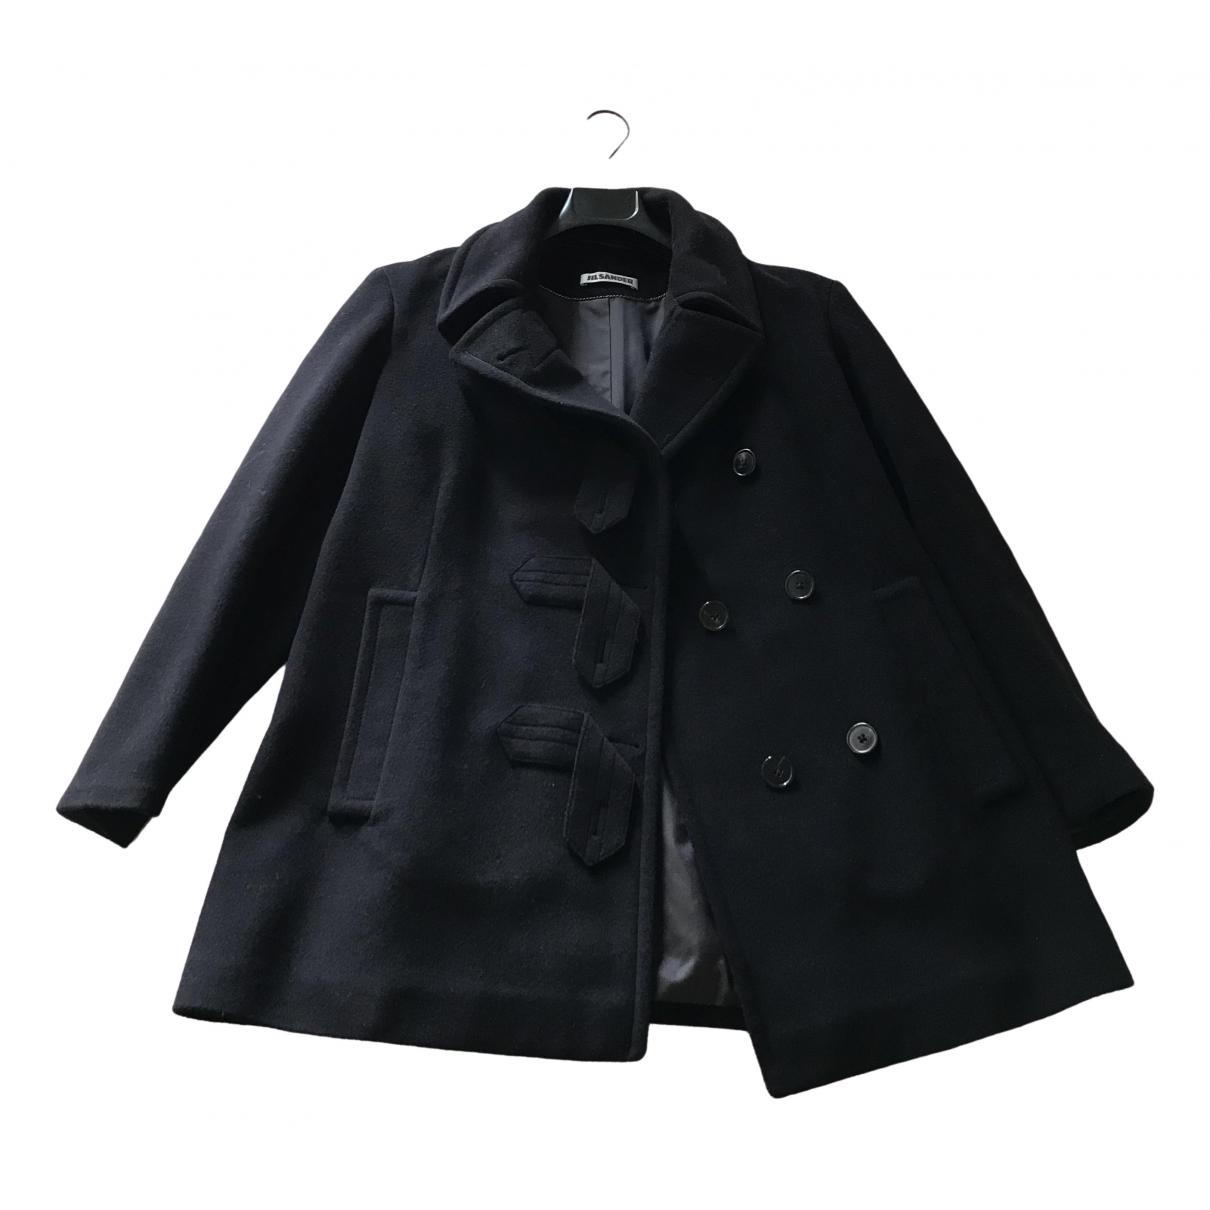 Jil Sander \N Black Cashmere coat for Women 38 IT